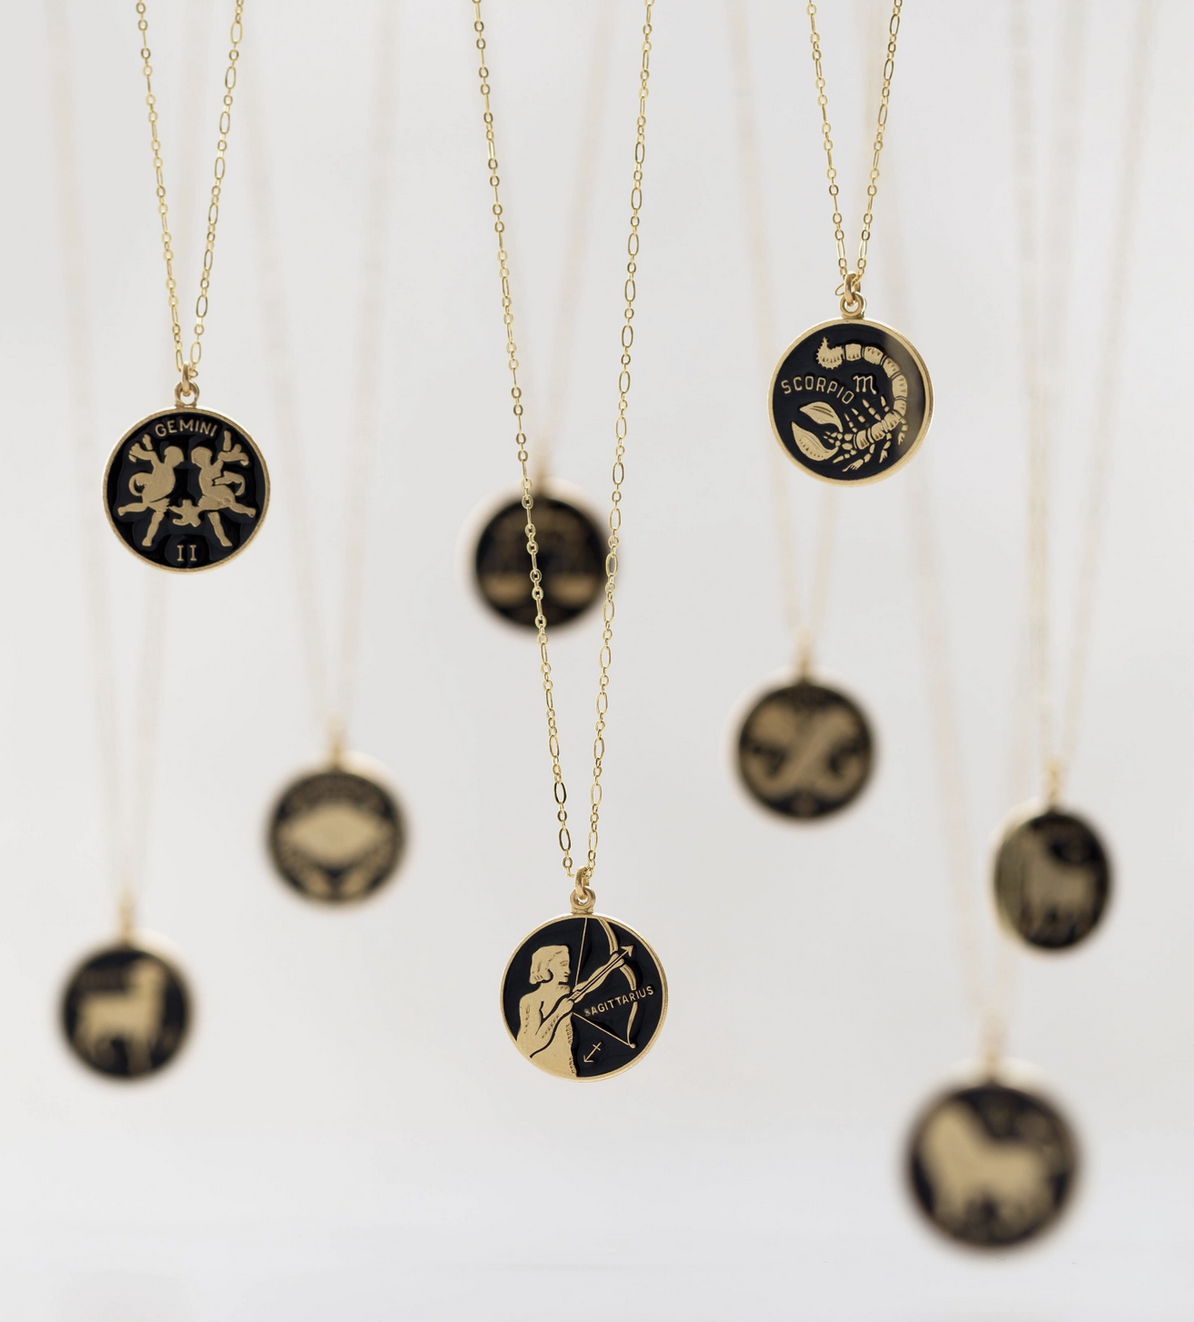 Amano Studio Black Enamel Zodiac Necklace